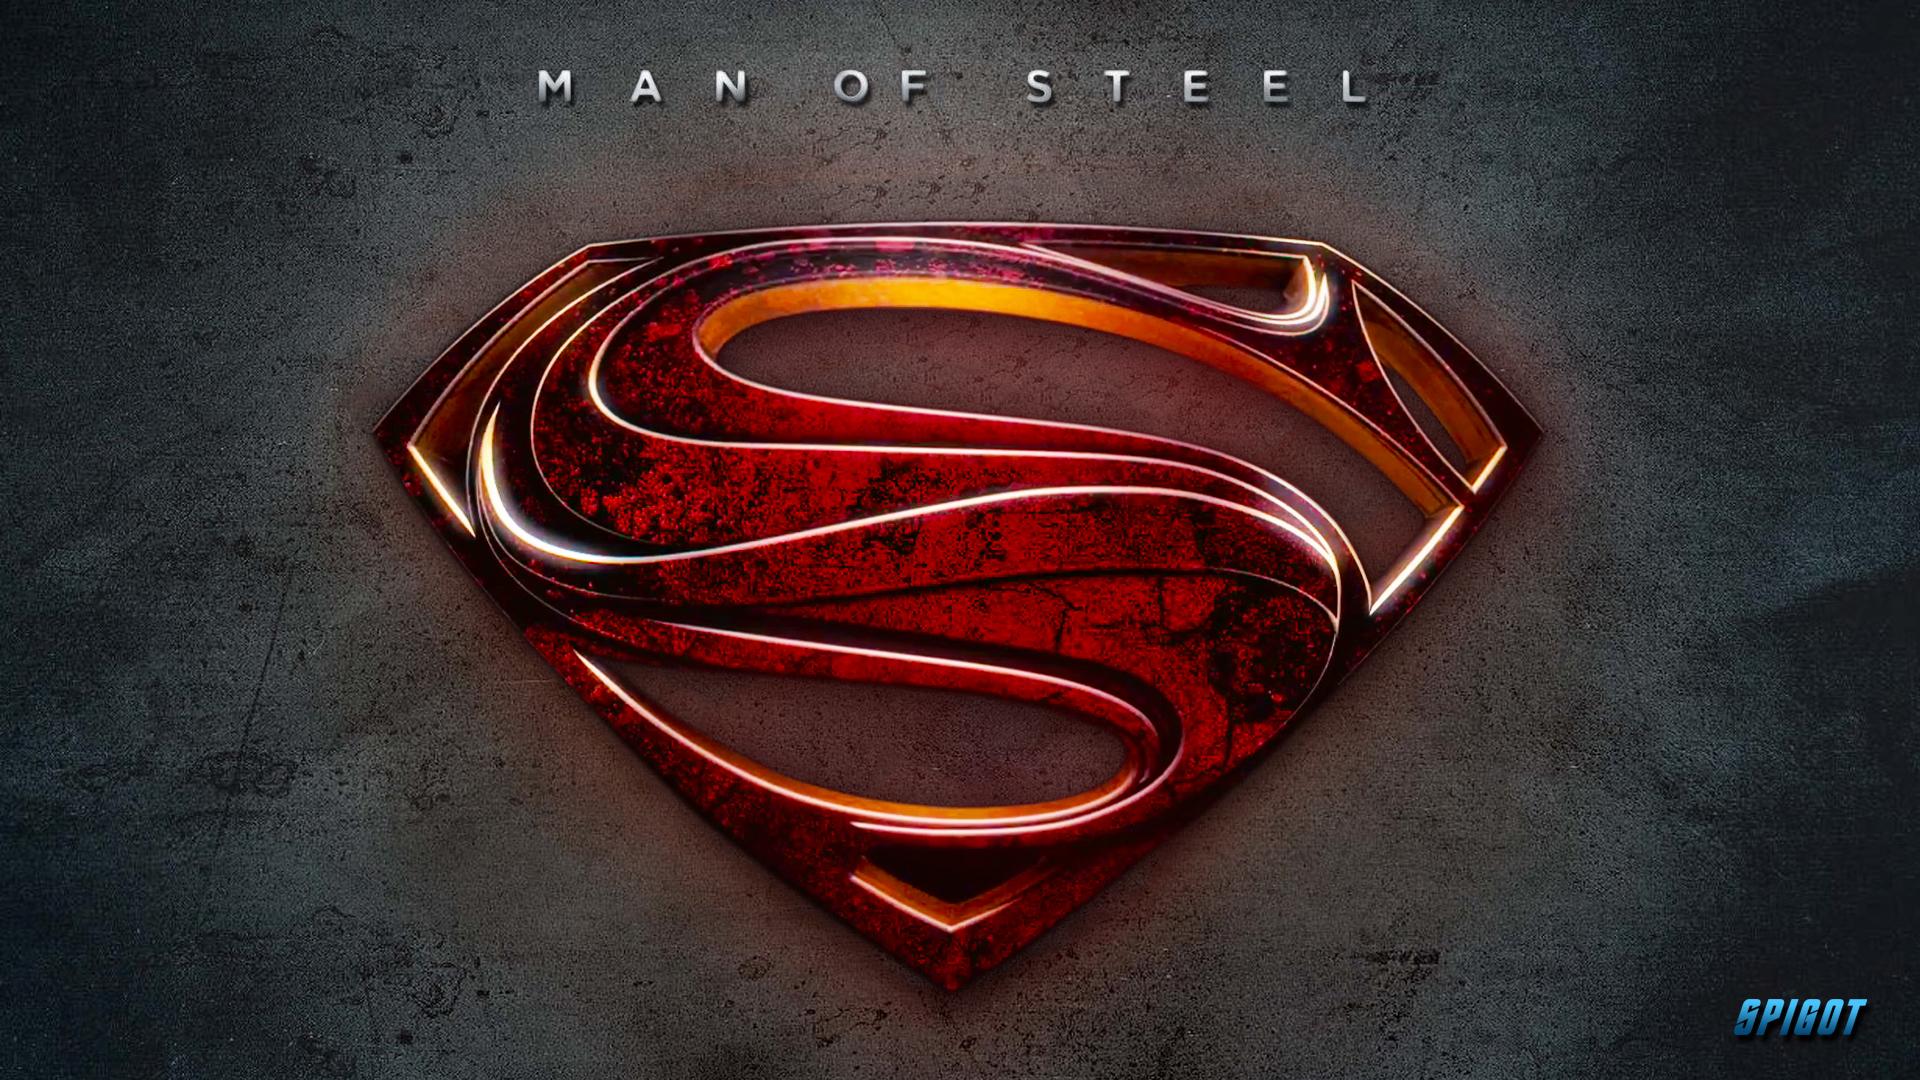 man of steel wallpapers   Man of Steel Wallpaper 34785631 1920x1080